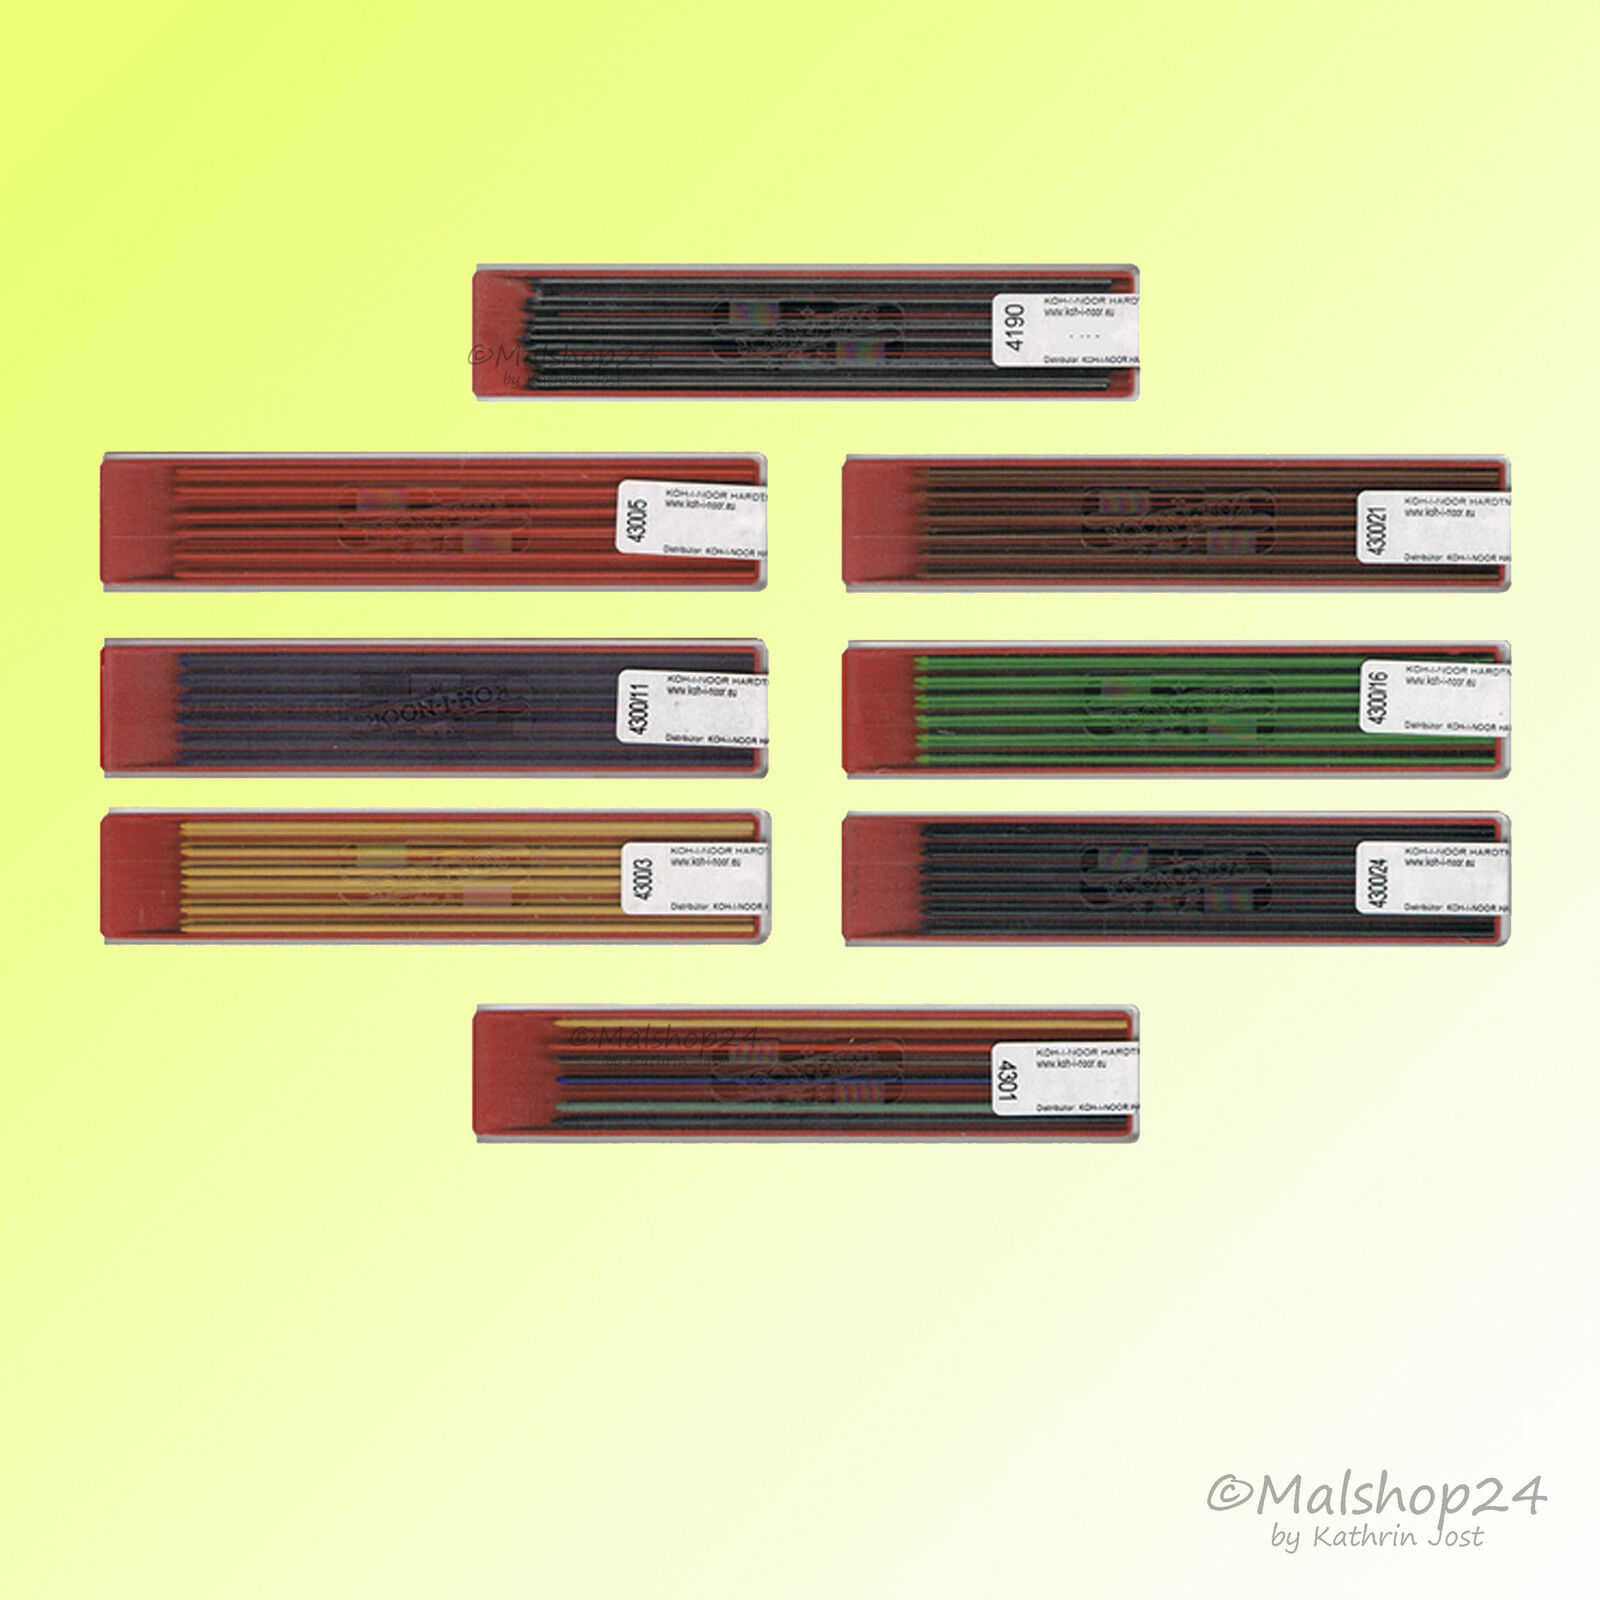 Fallminen 2 mm Bleistiftminen/bunte Minen Farbminen für Fallbleistift Bleistift